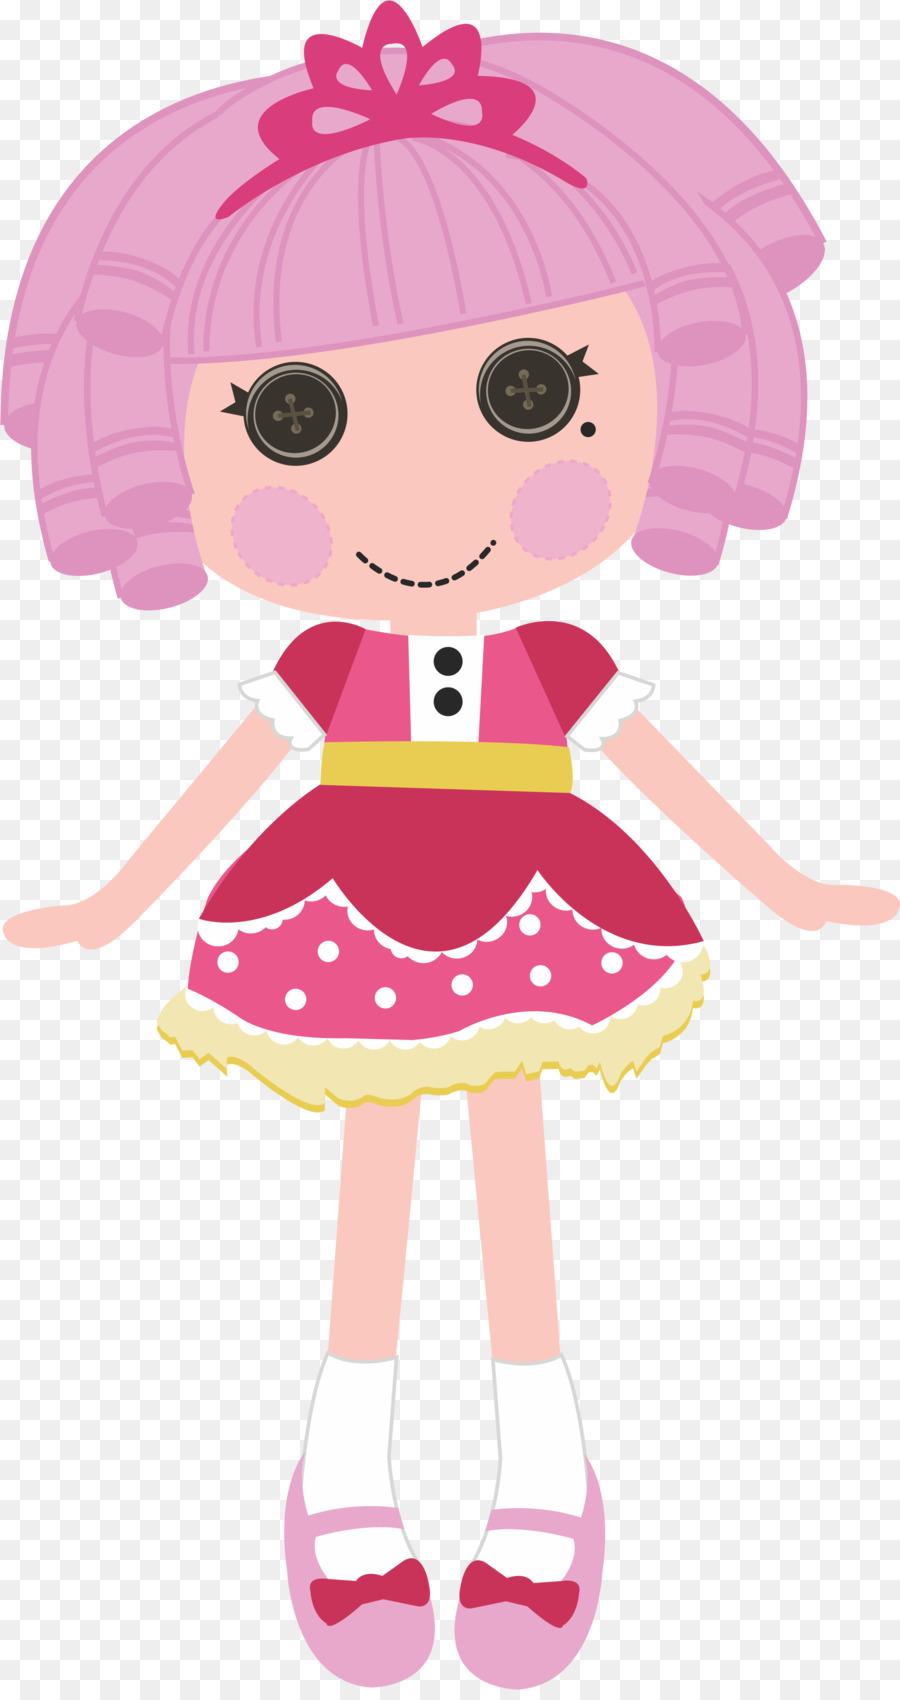 Lalaloopsy Clothing Dress Doll Party - L png download - 1777*3336 ...